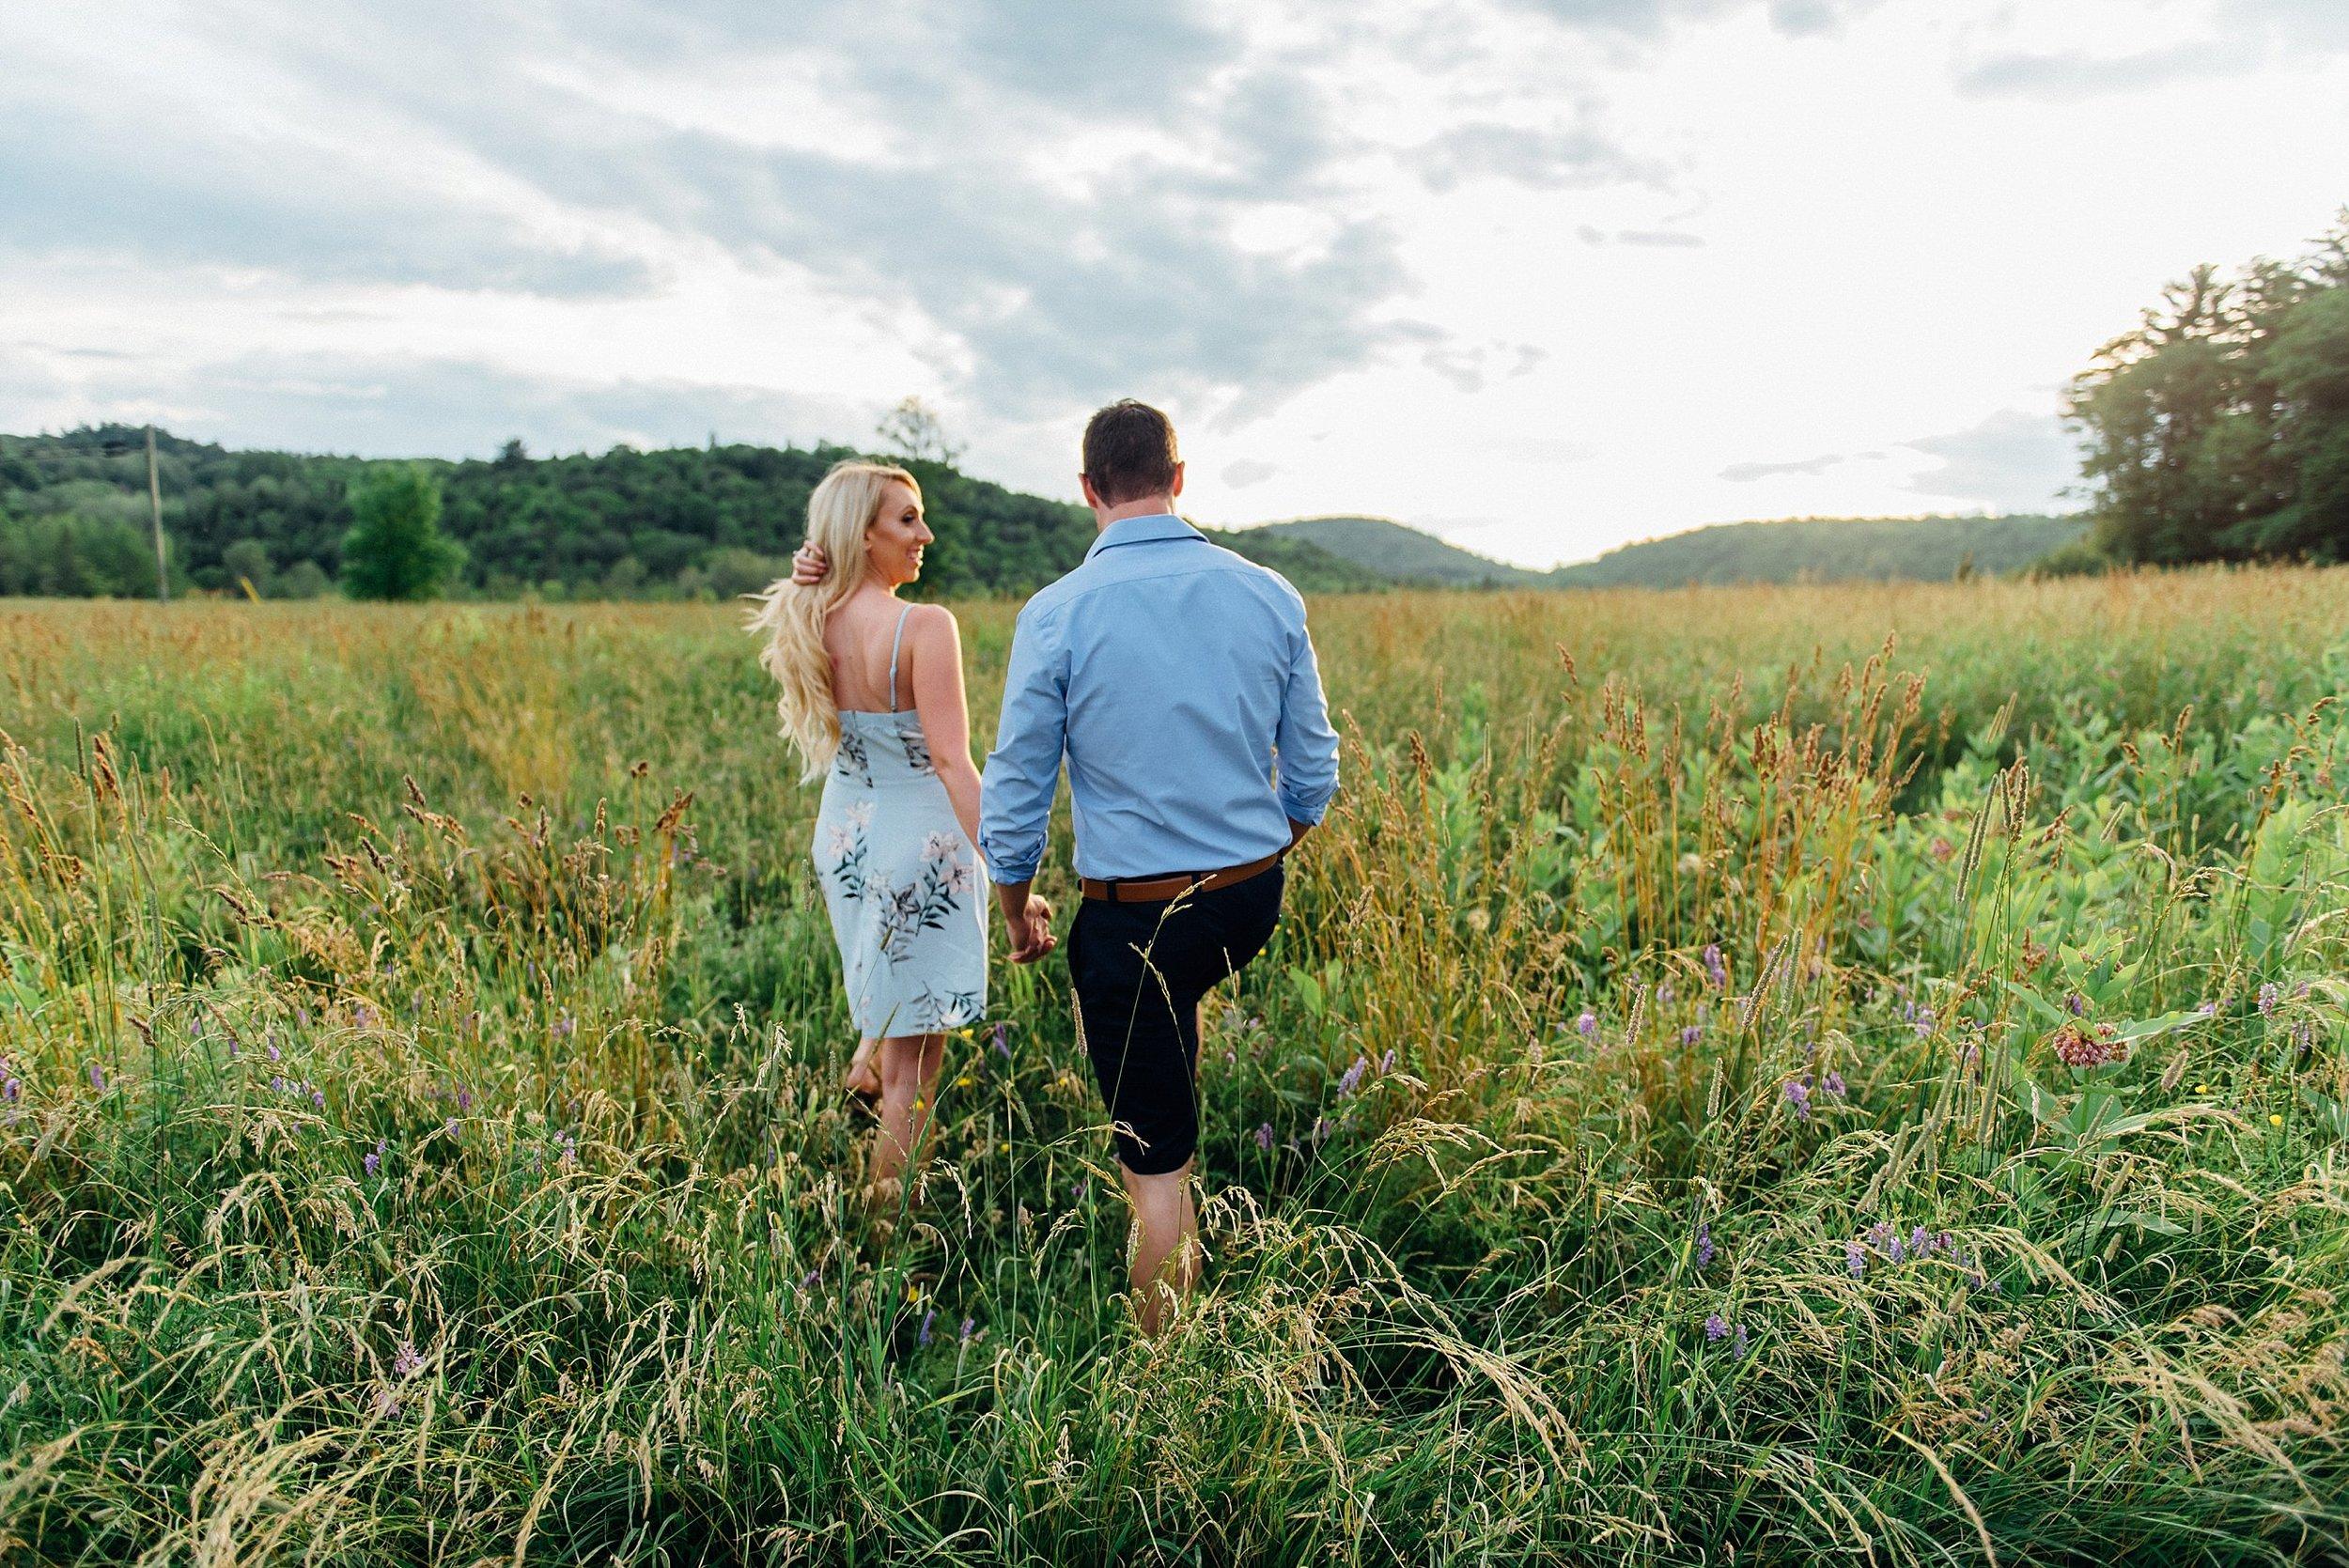 Ali and Batoul Photography - light, airy, indie documentary Ottawa wedding photographer_0043.jpg